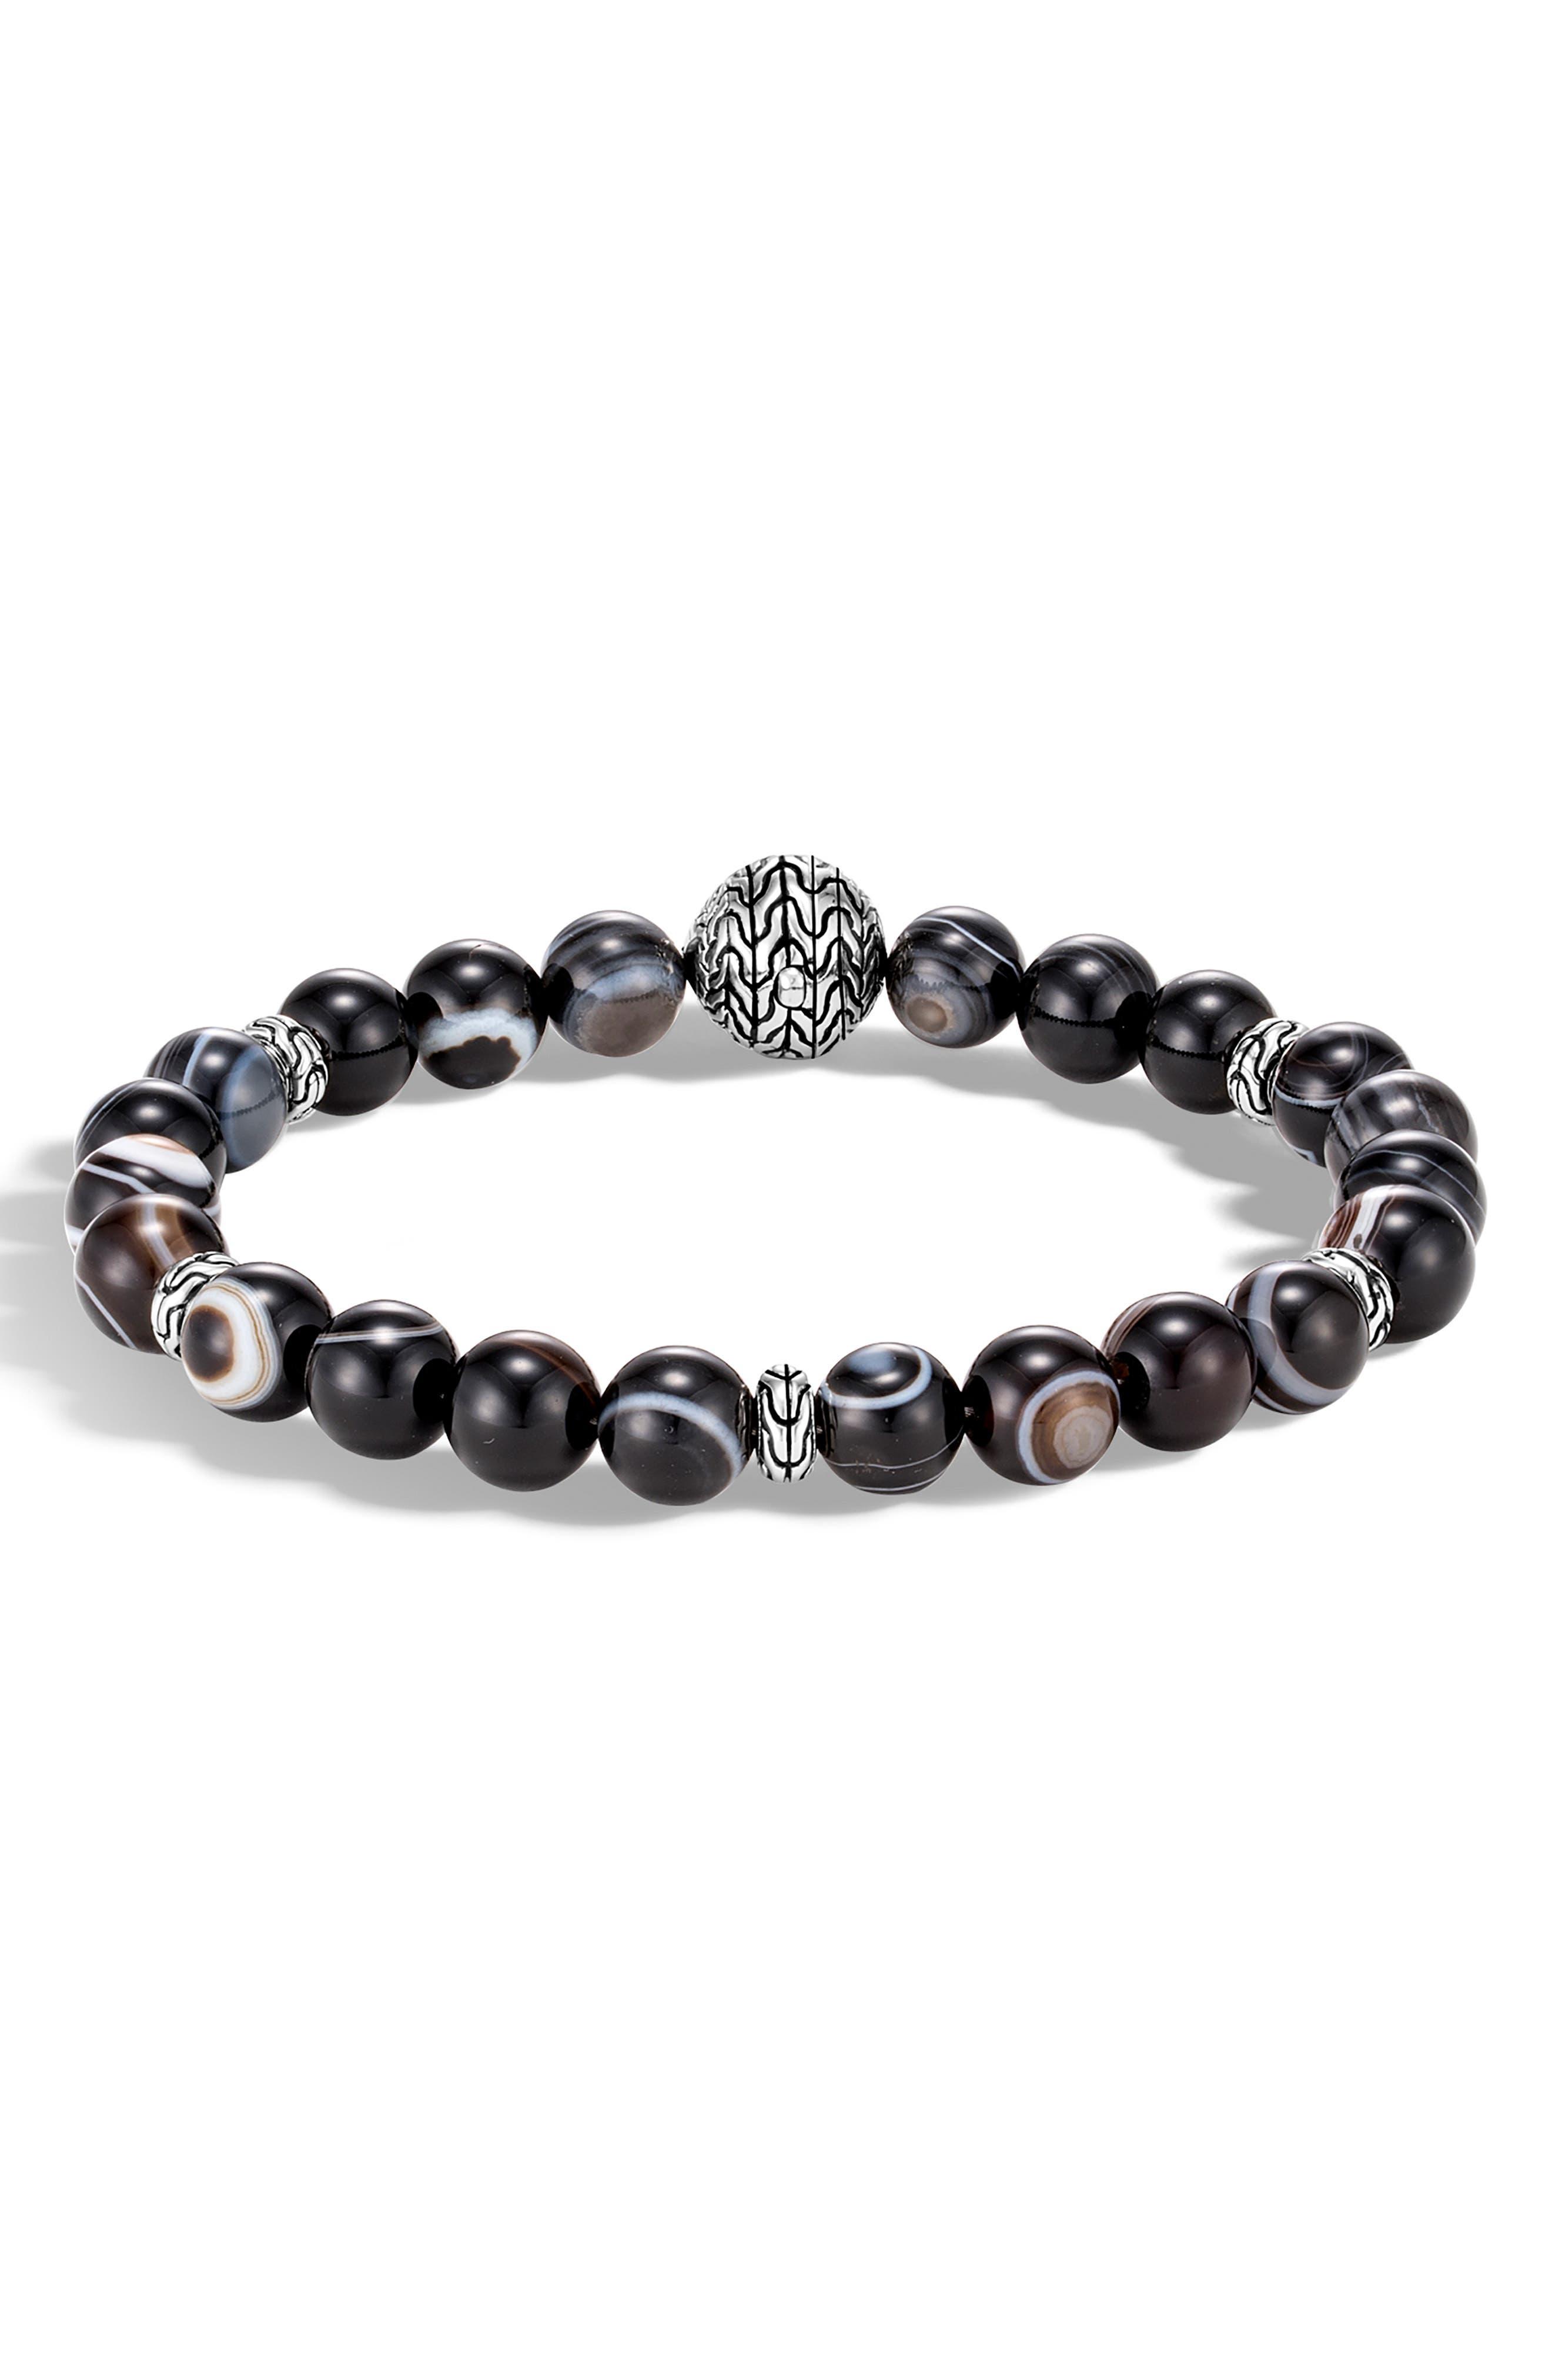 Men's Classic Chain Banded Agate Bracelet,                         Main,                         color, SILVER/ SODALITE/ HEMATITE